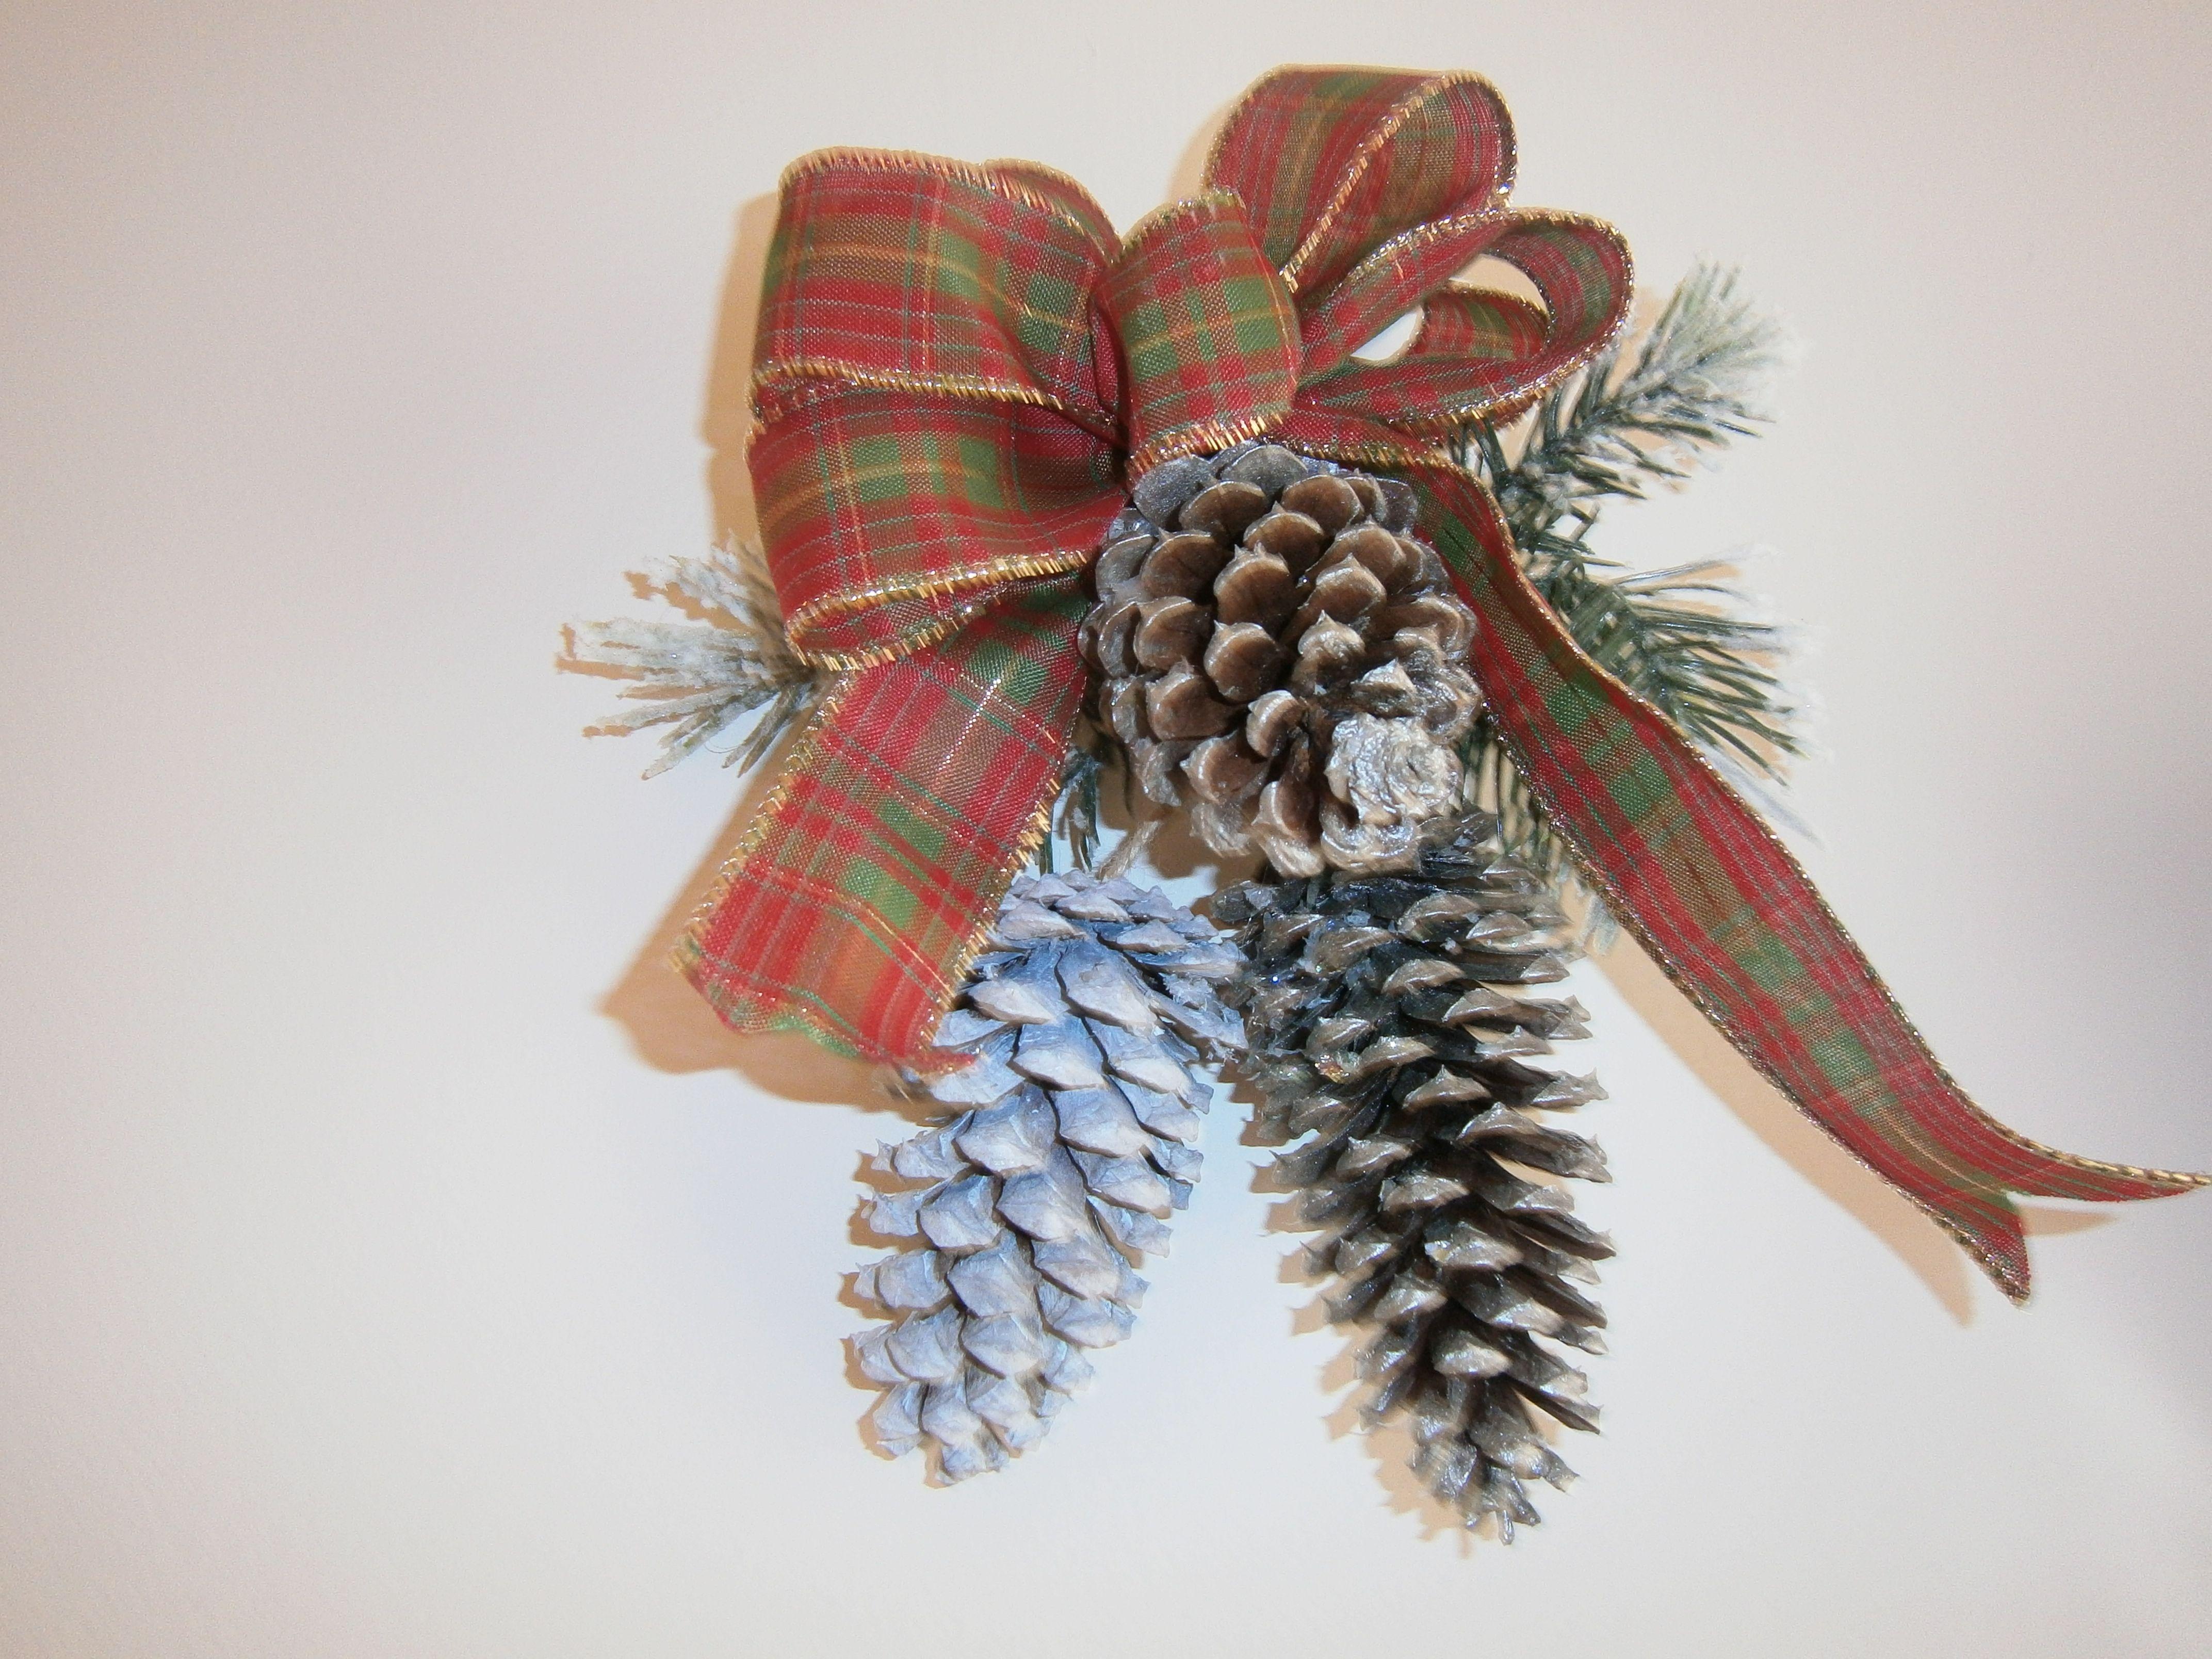 pine cone ornament pine cone ornaments pinterest. Black Bedroom Furniture Sets. Home Design Ideas